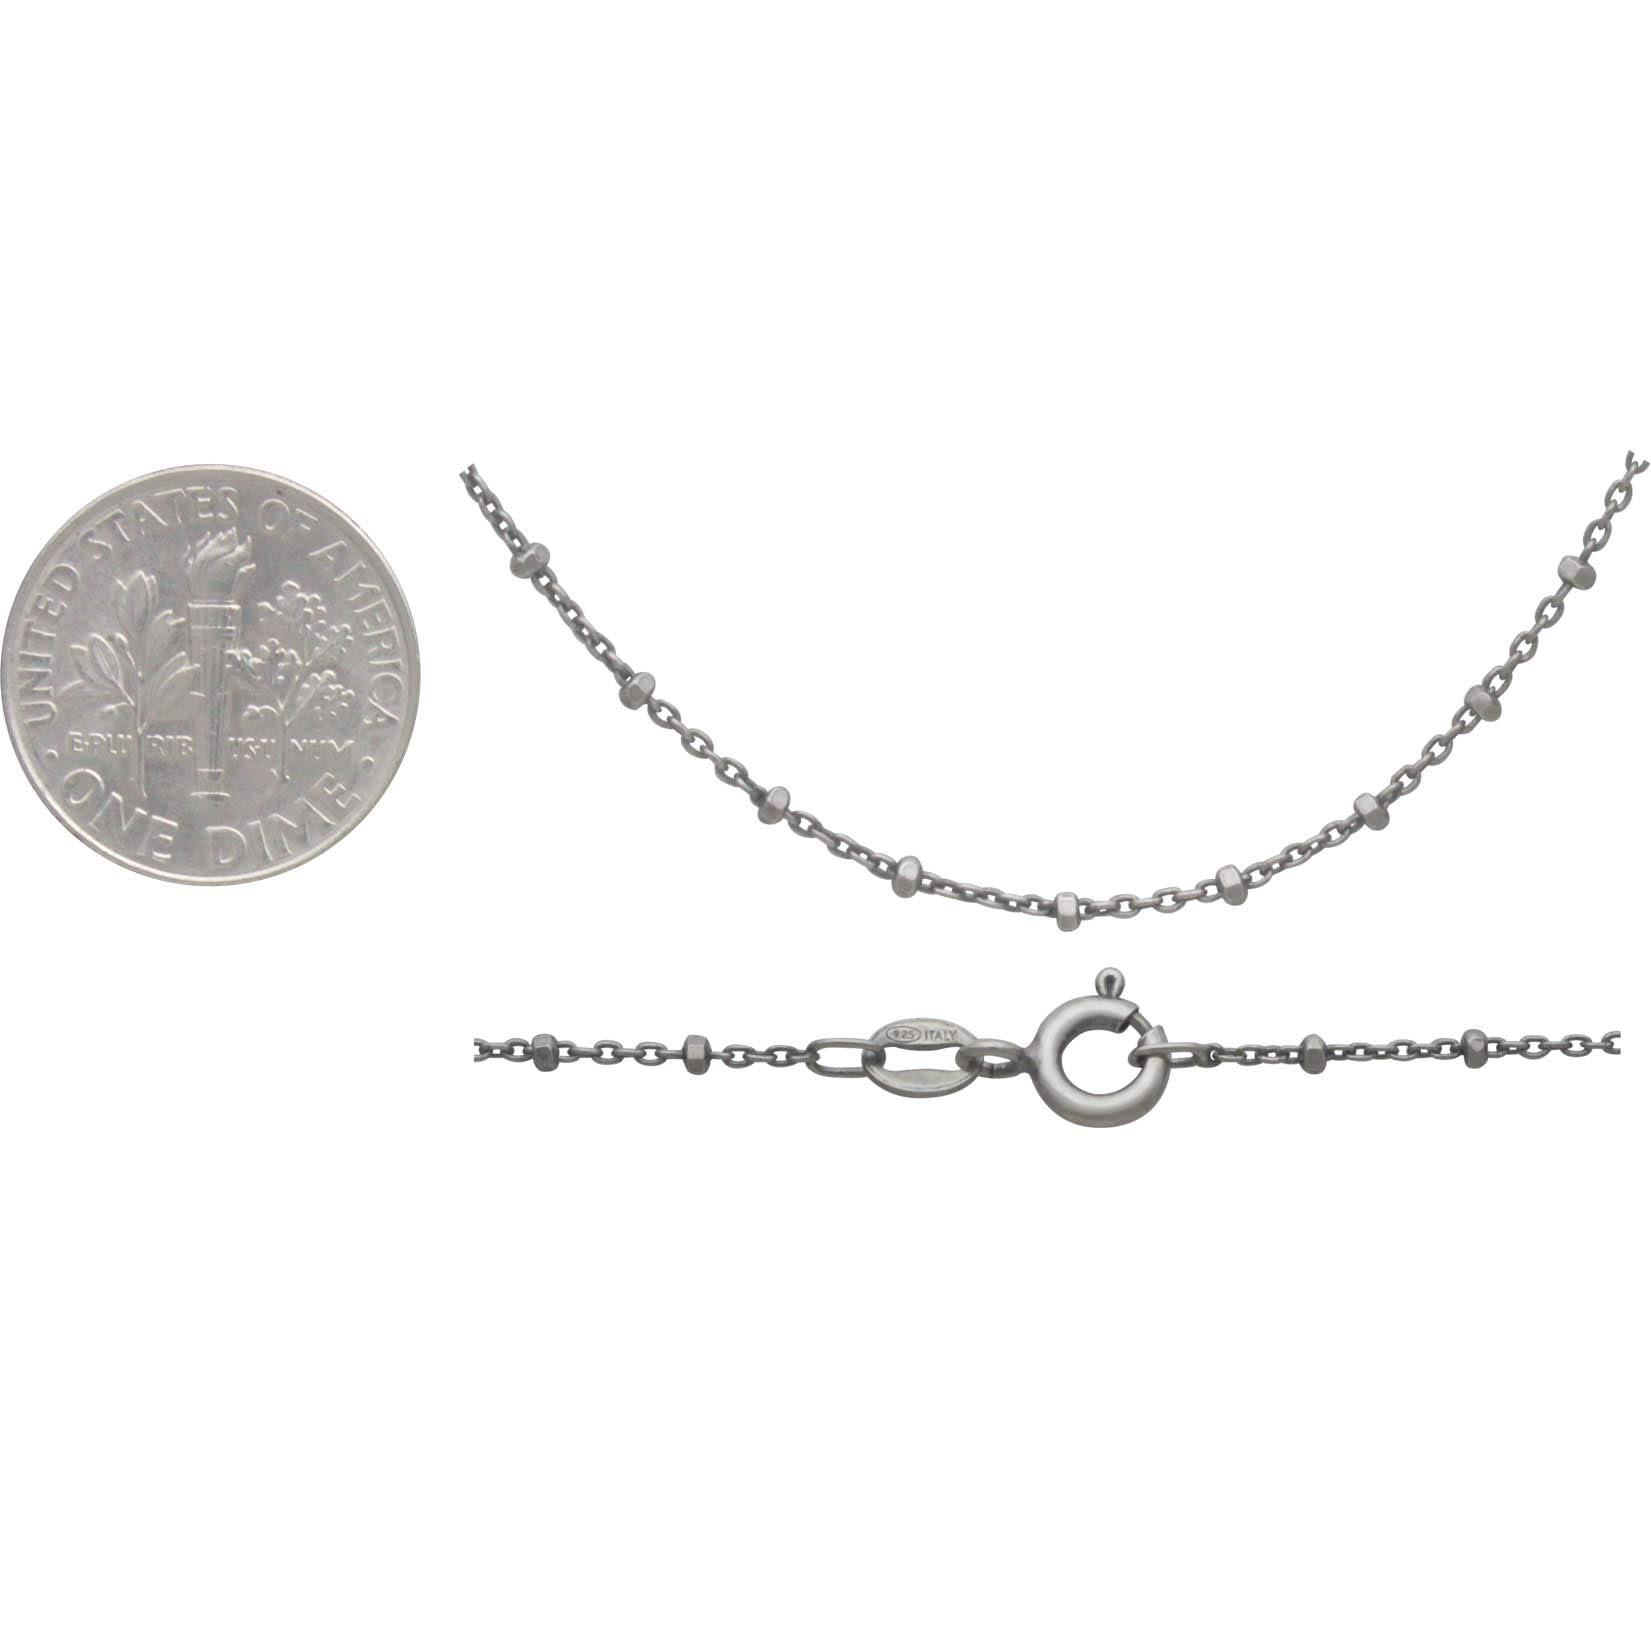 Sterling Silver Chain - 16 inch Diamond Cut Station Chain